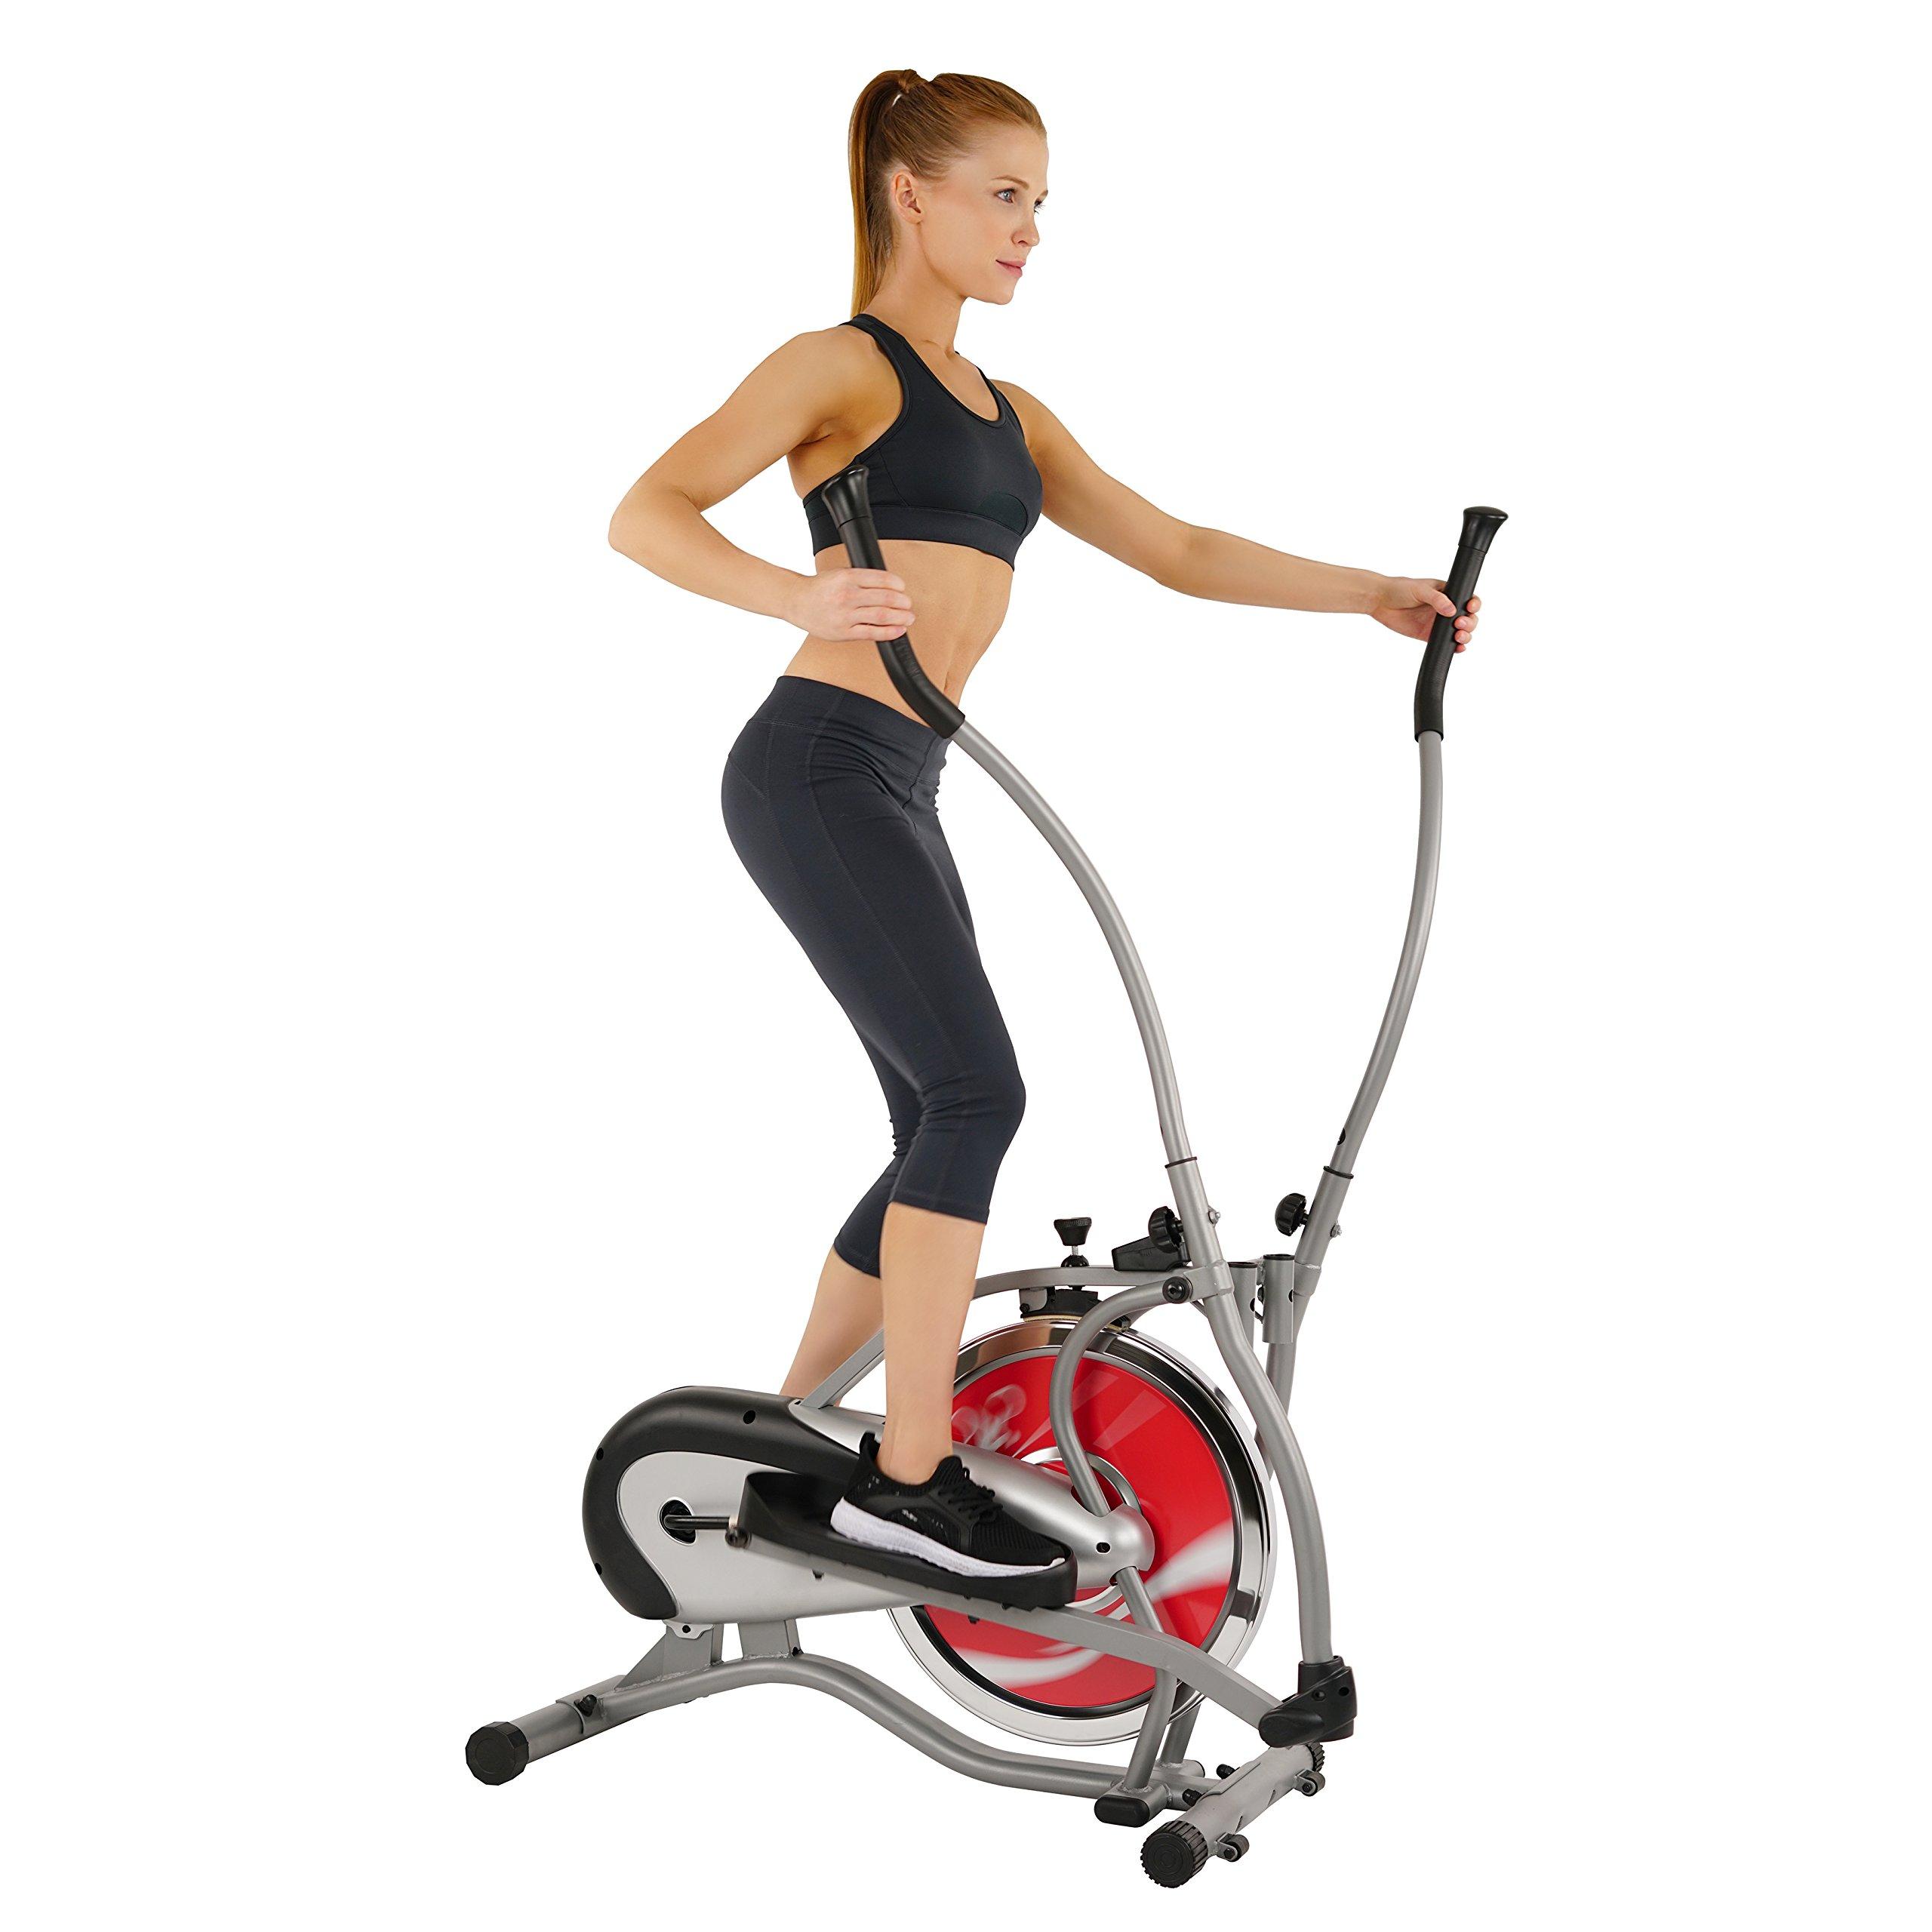 Sunny Health & Fitness SF-E1405 Flywheel Elliptical Trainer, Gray by Sunny Health & Fitness (Image #3)